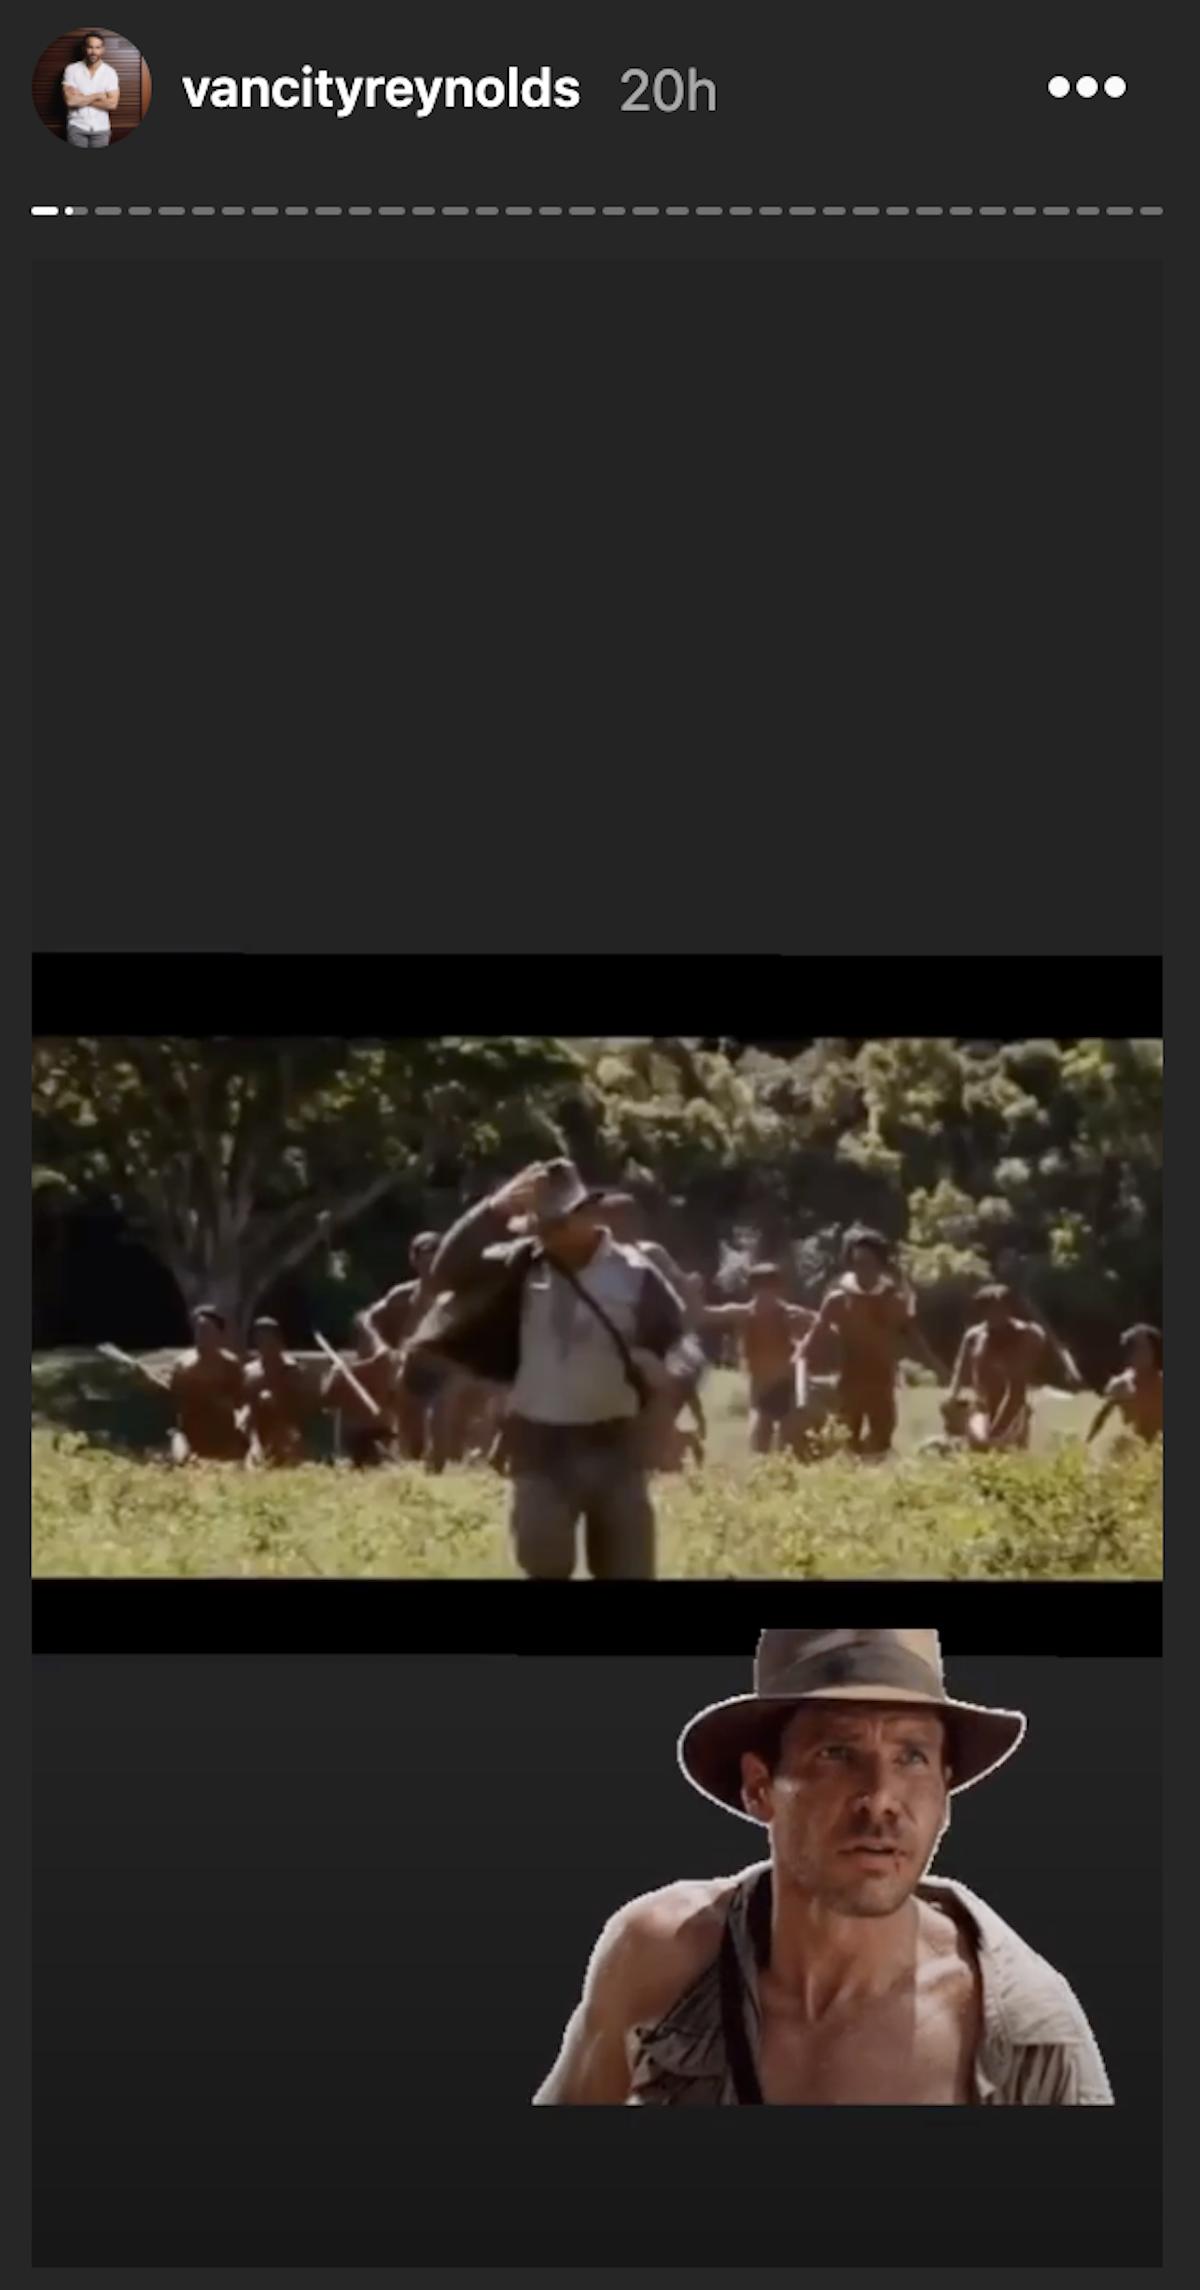 Indiana Jones running away